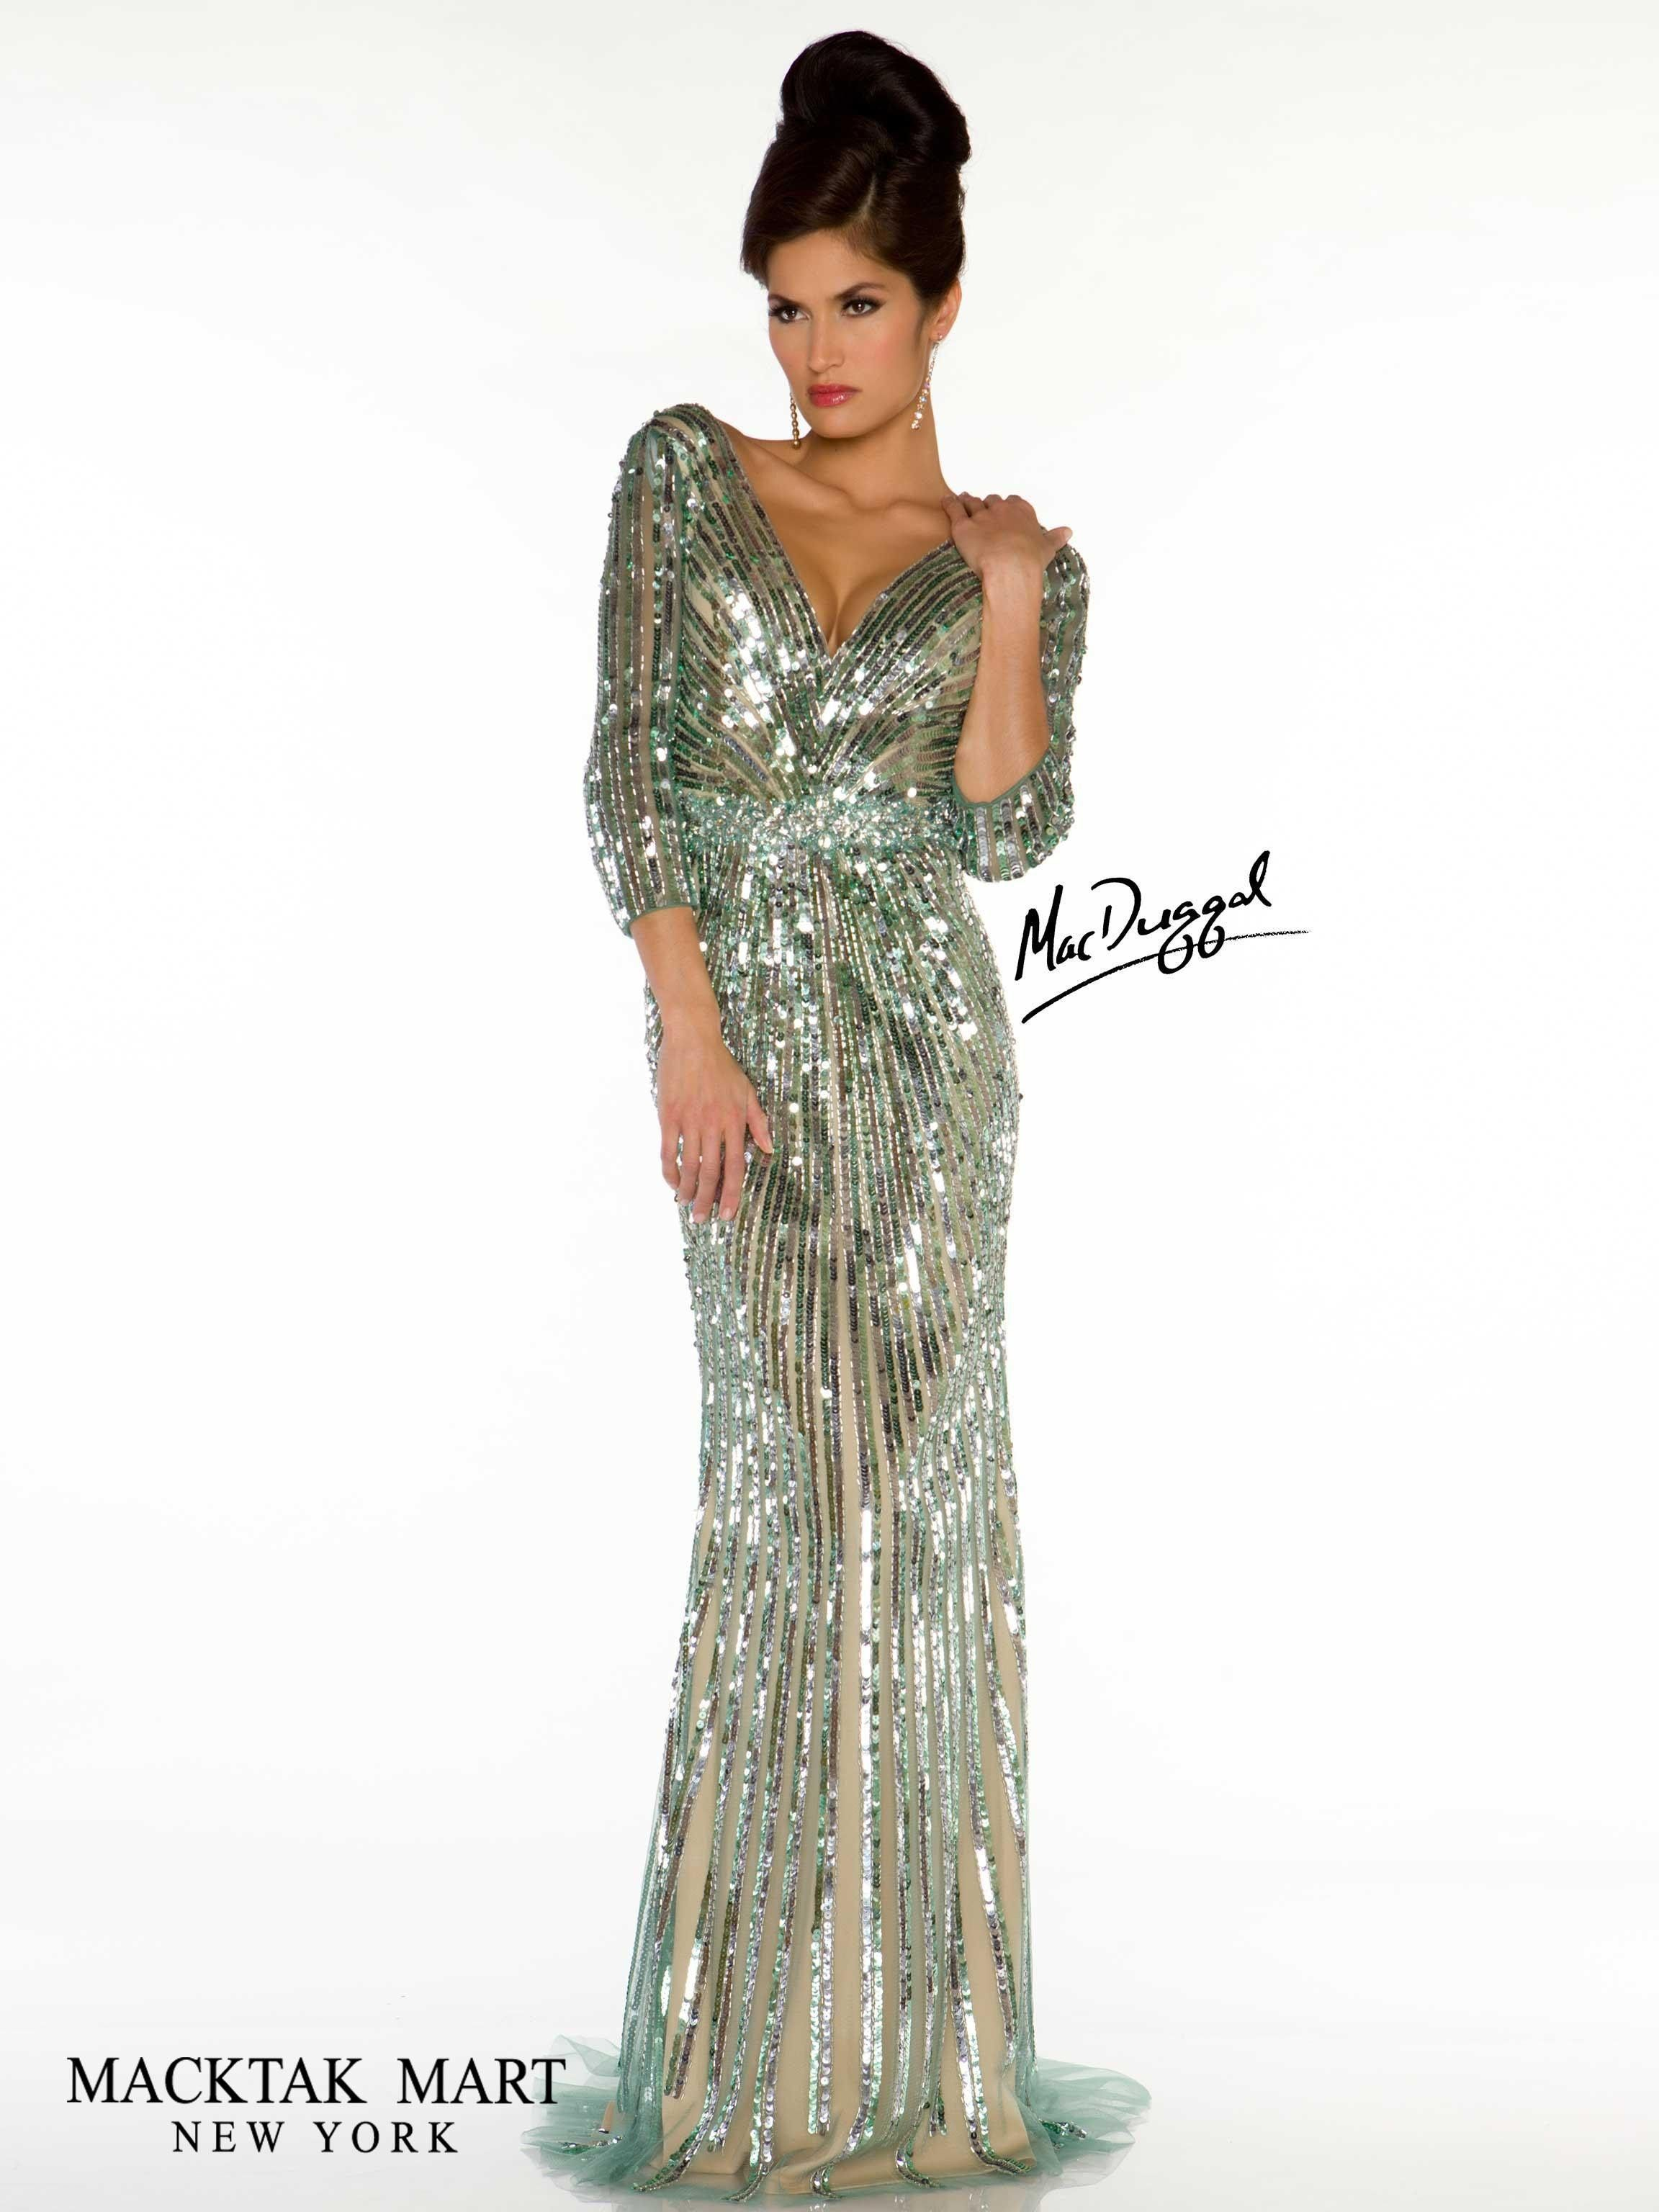 Mac duggal dress long dresses pinterest macs style clothes